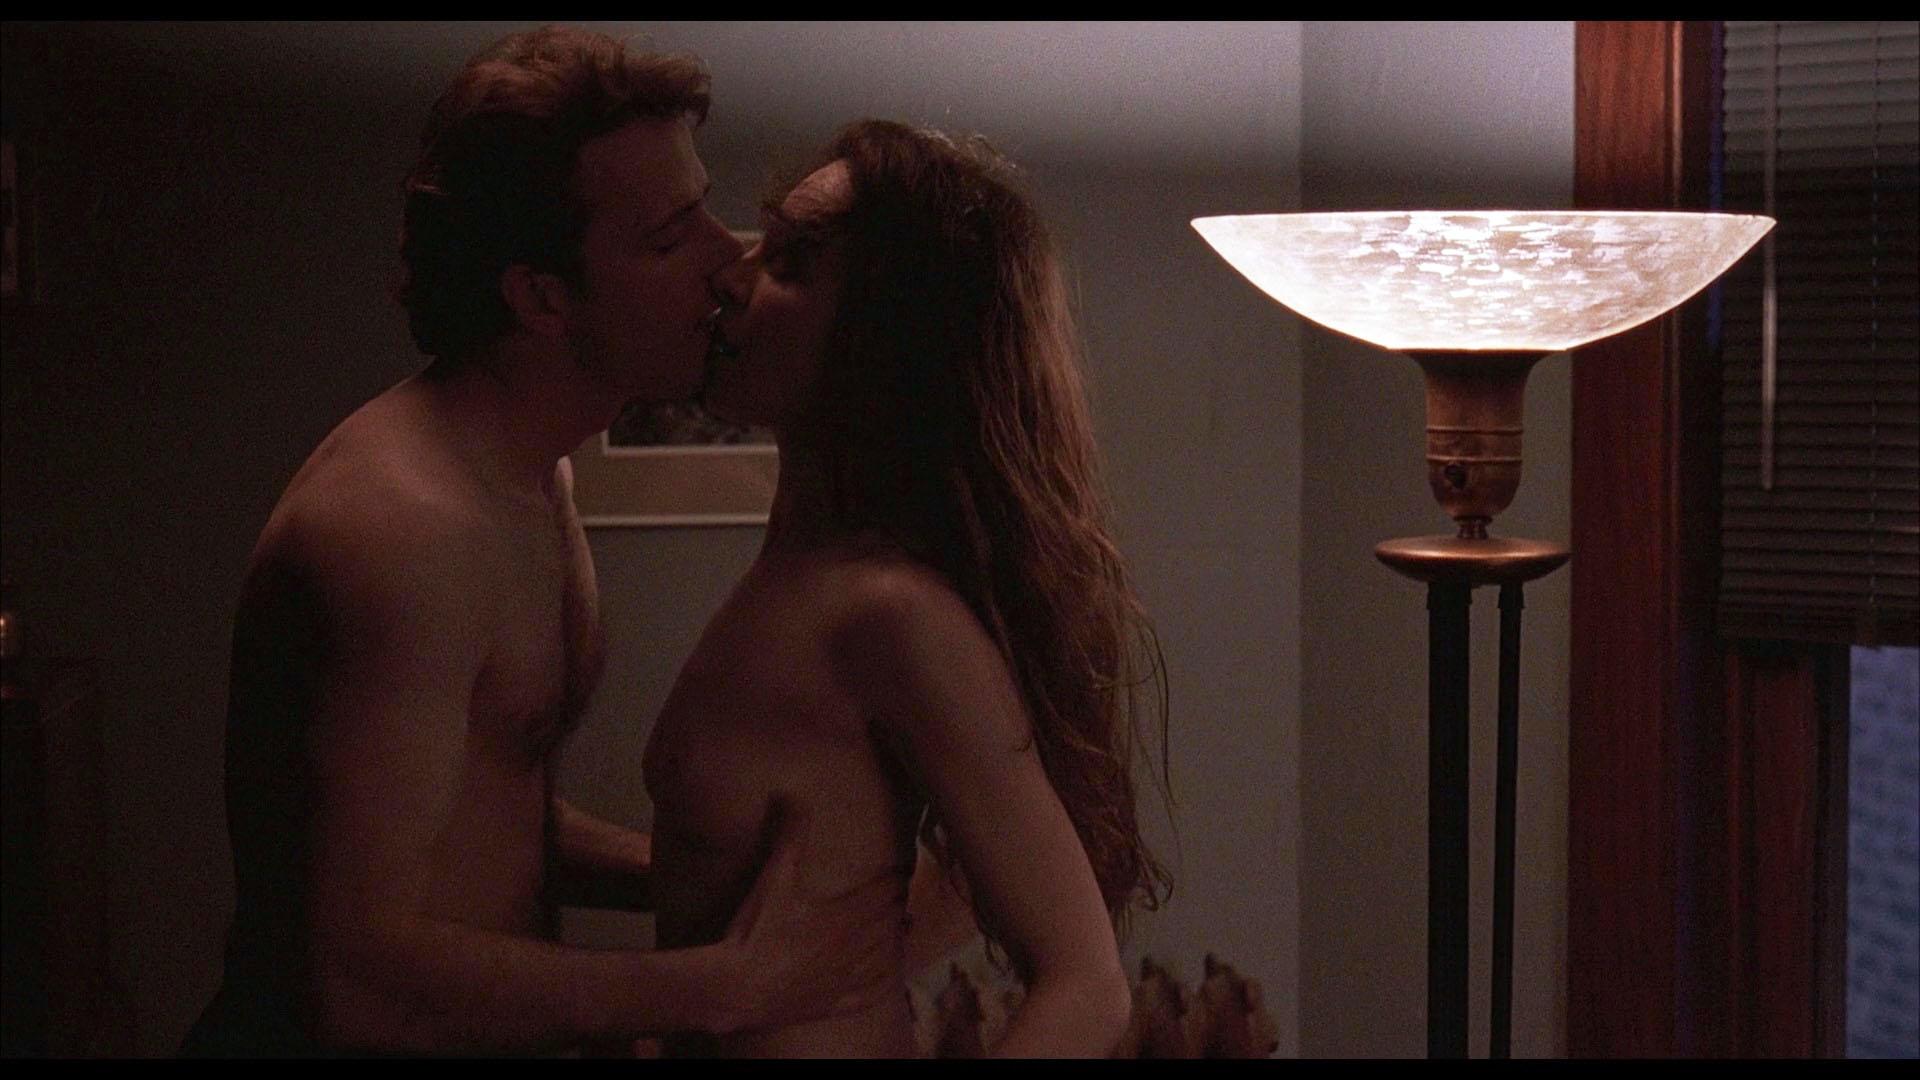 Madeleine stowe nude scenes share